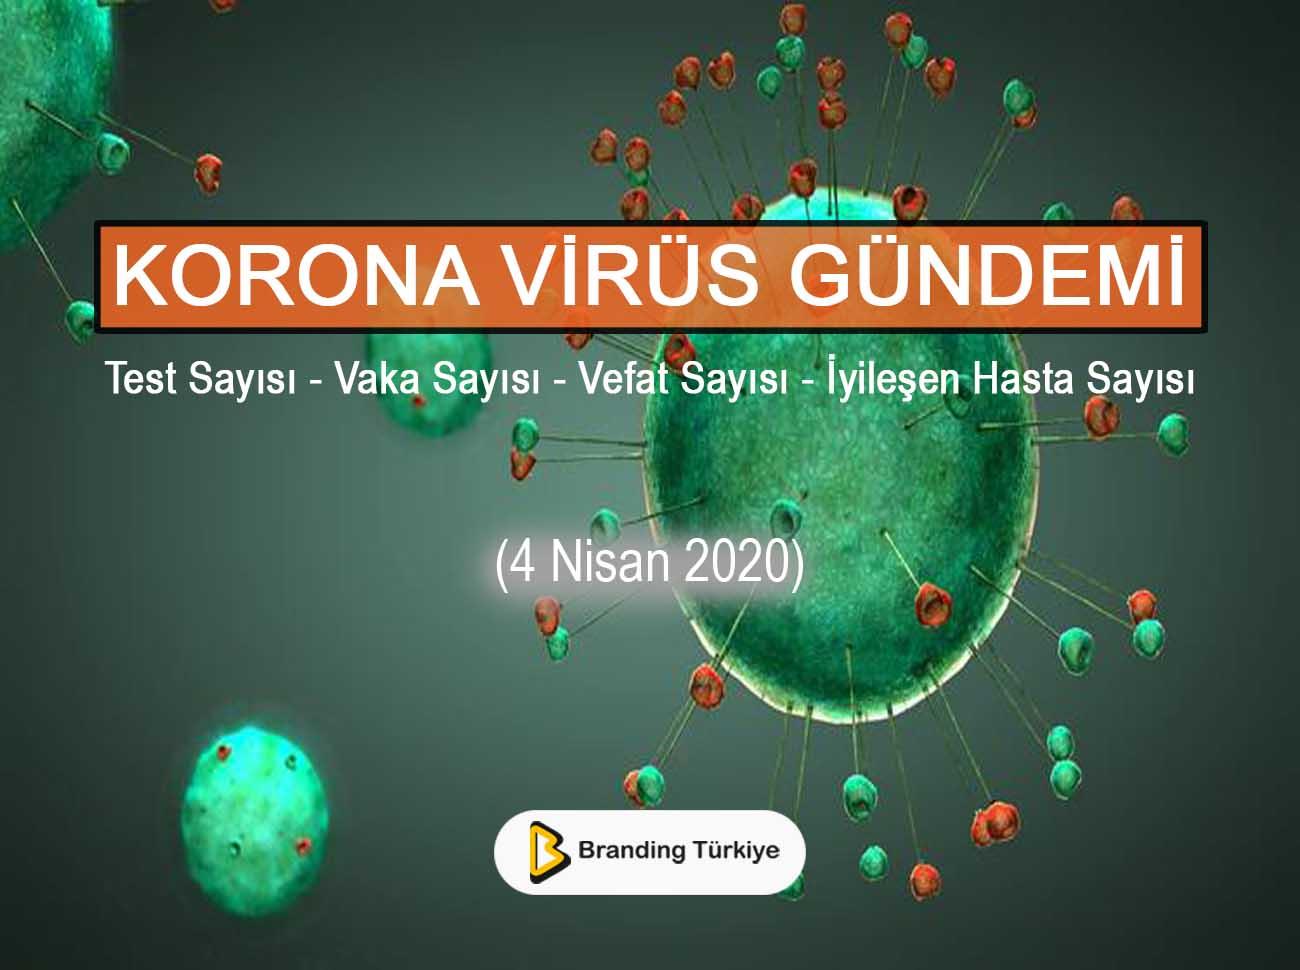 Korona Virüs Gündemi (4 Nisan 2020)